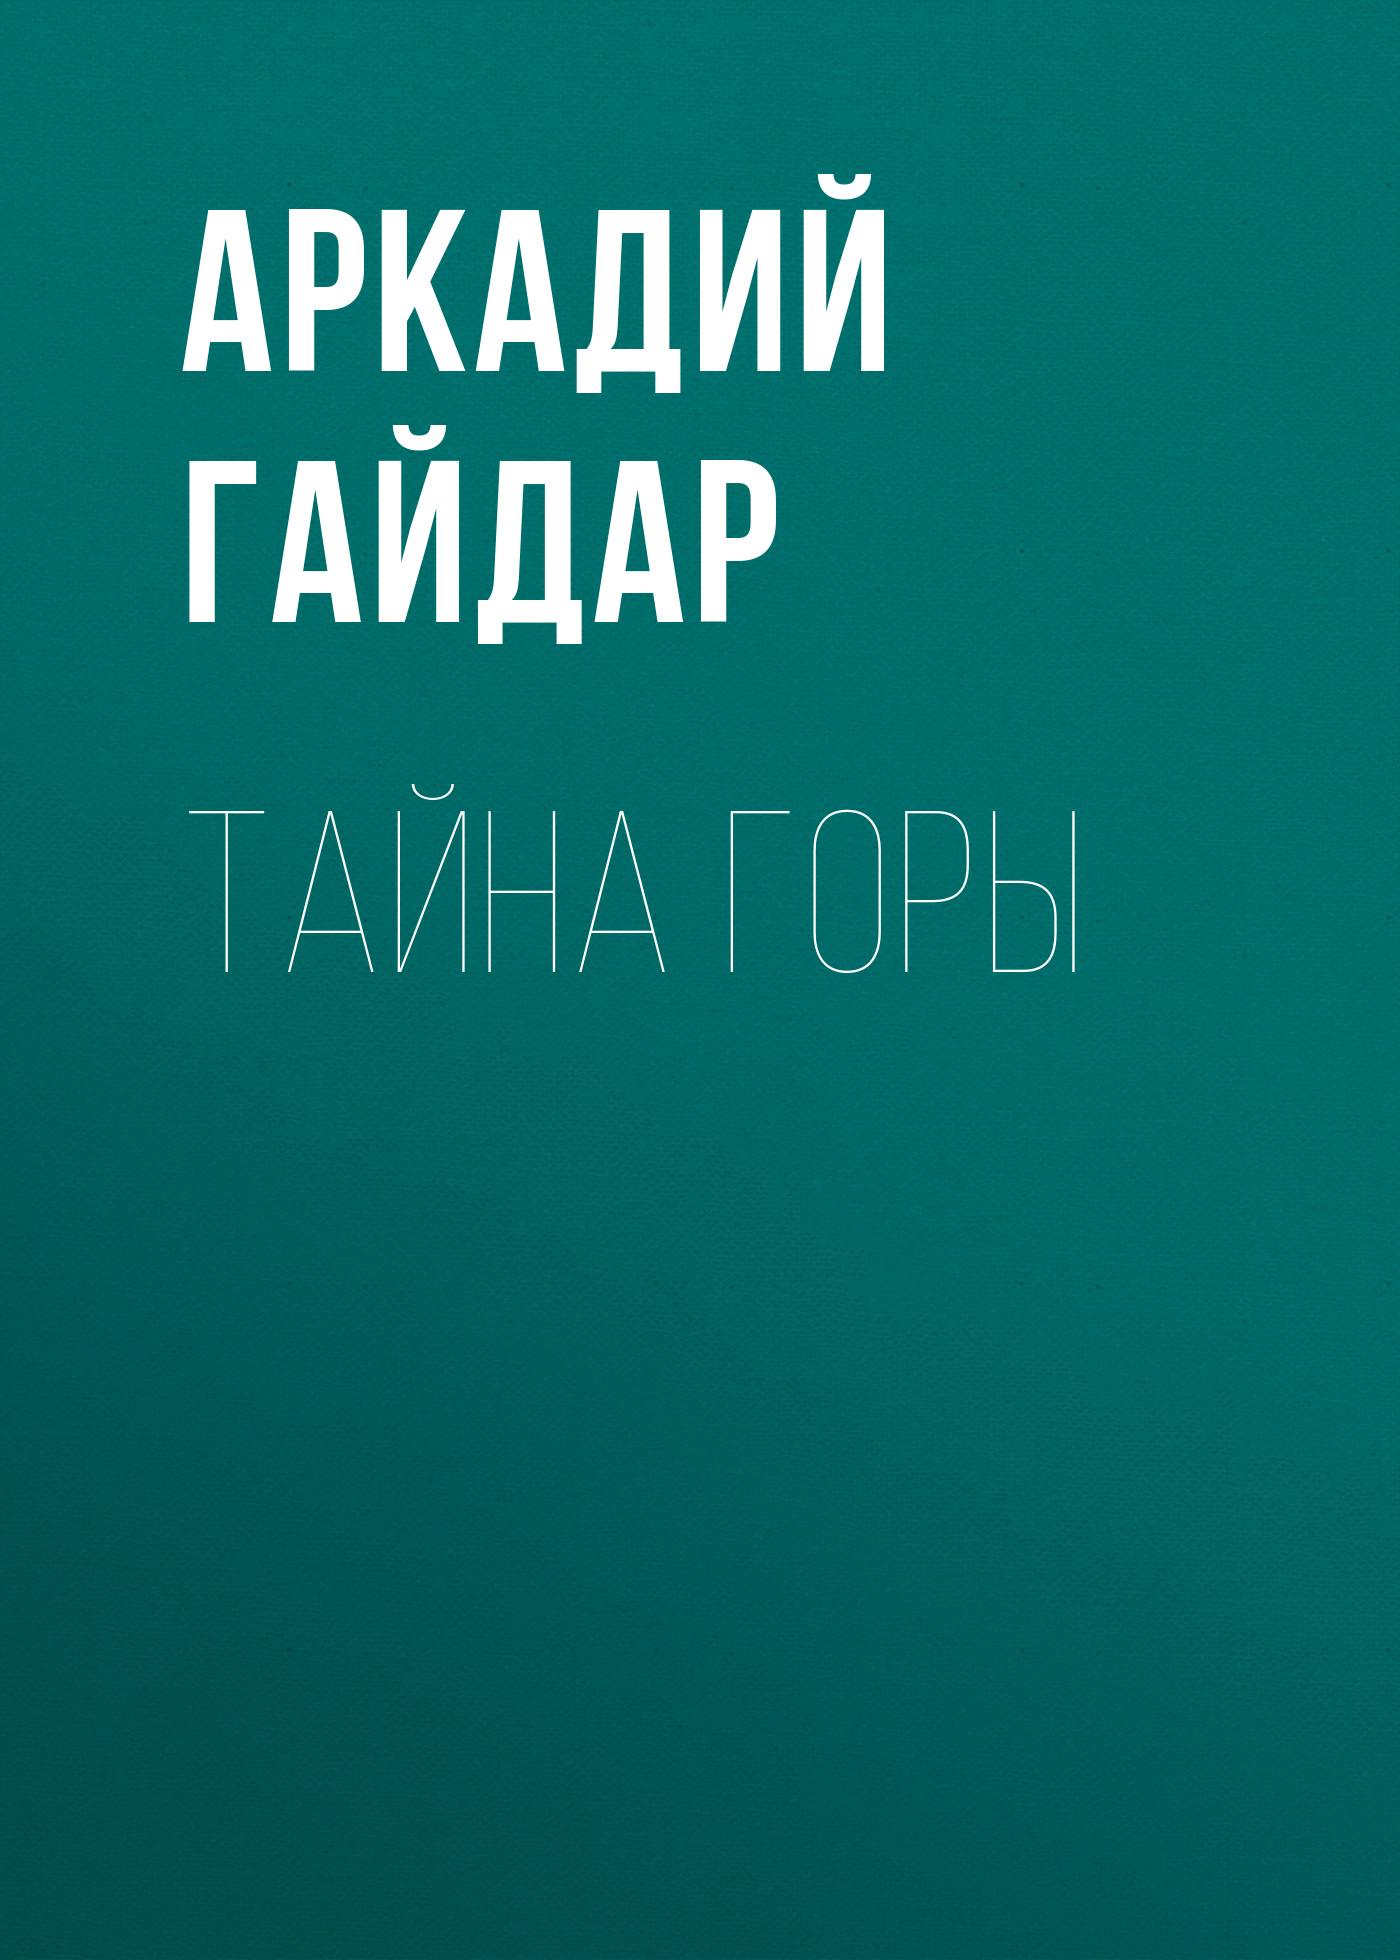 Аркадий Гайдар Тайна горы аркадий степной верой и правдой